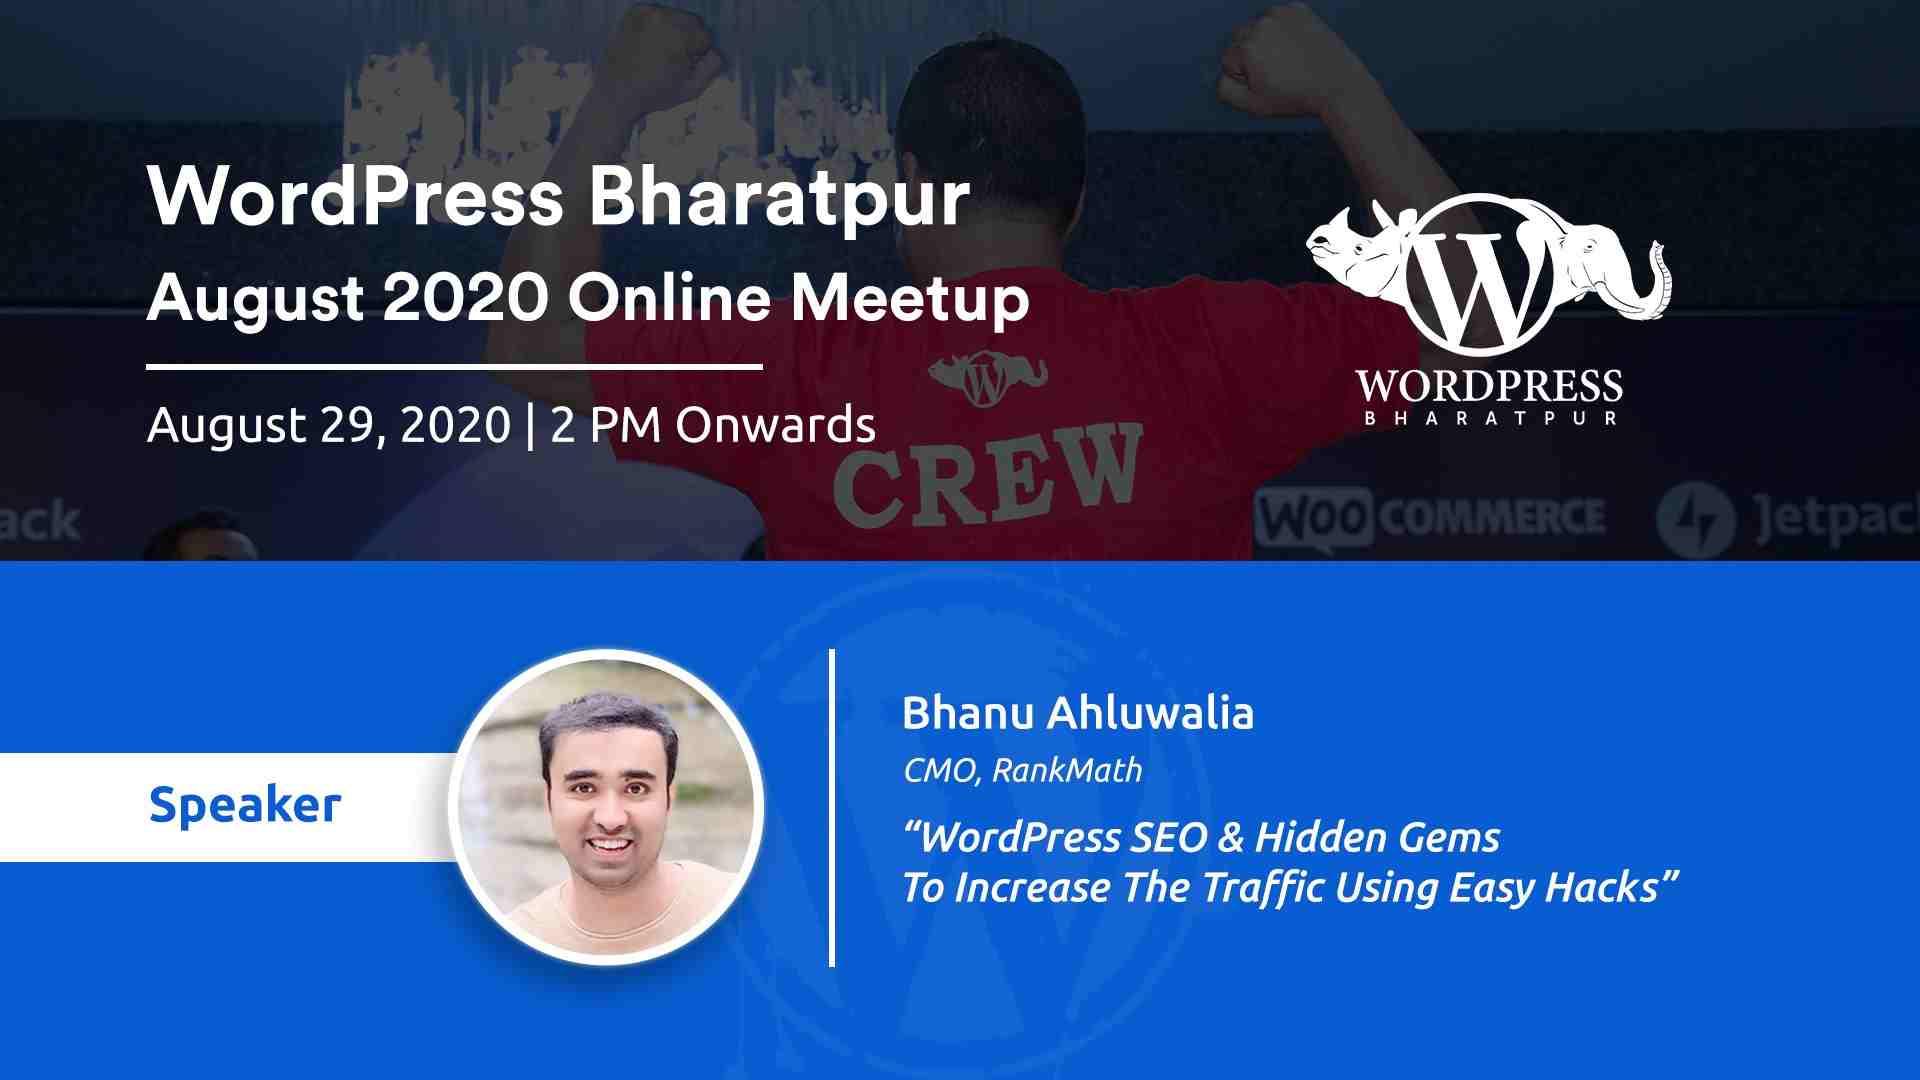 WordPress Bharatpur August 2020 Meetup